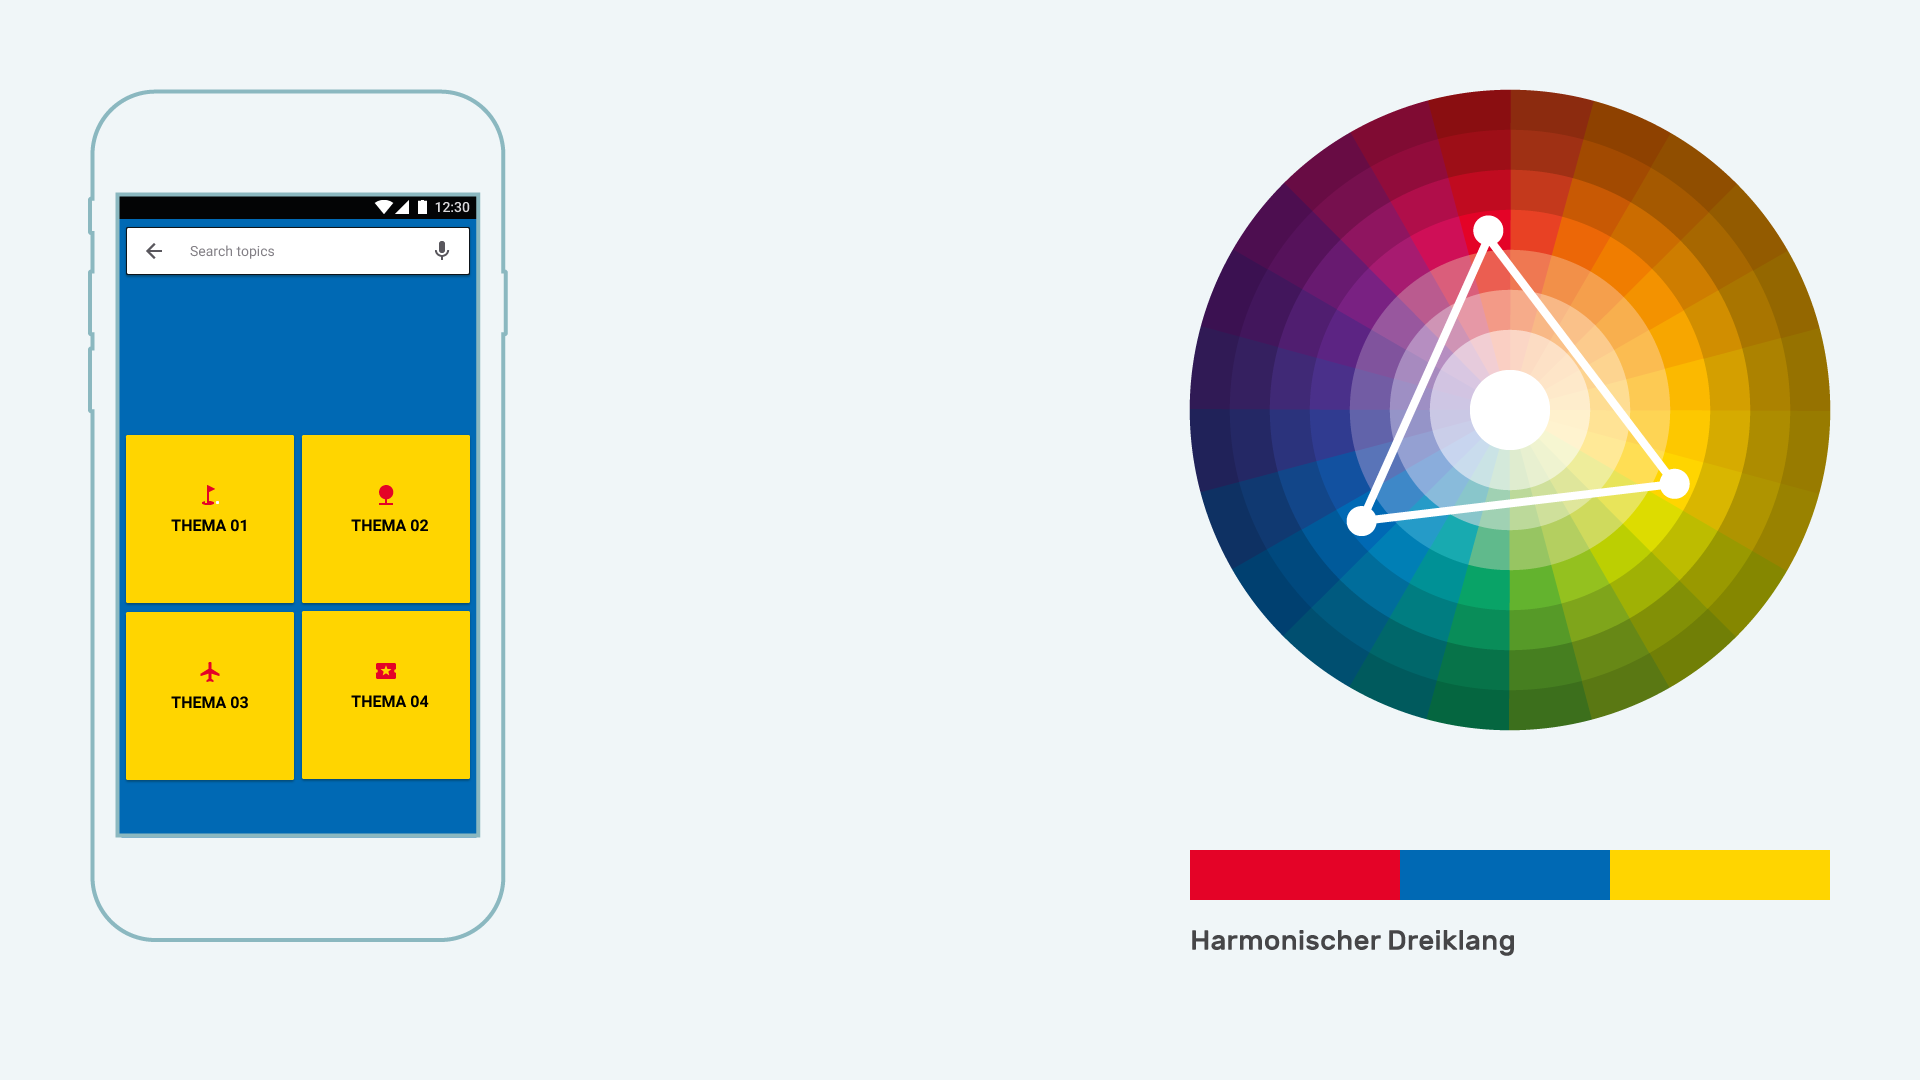 Infografik Userinterfacedesign Farbharmonien harmonischer Dreiklang positiv